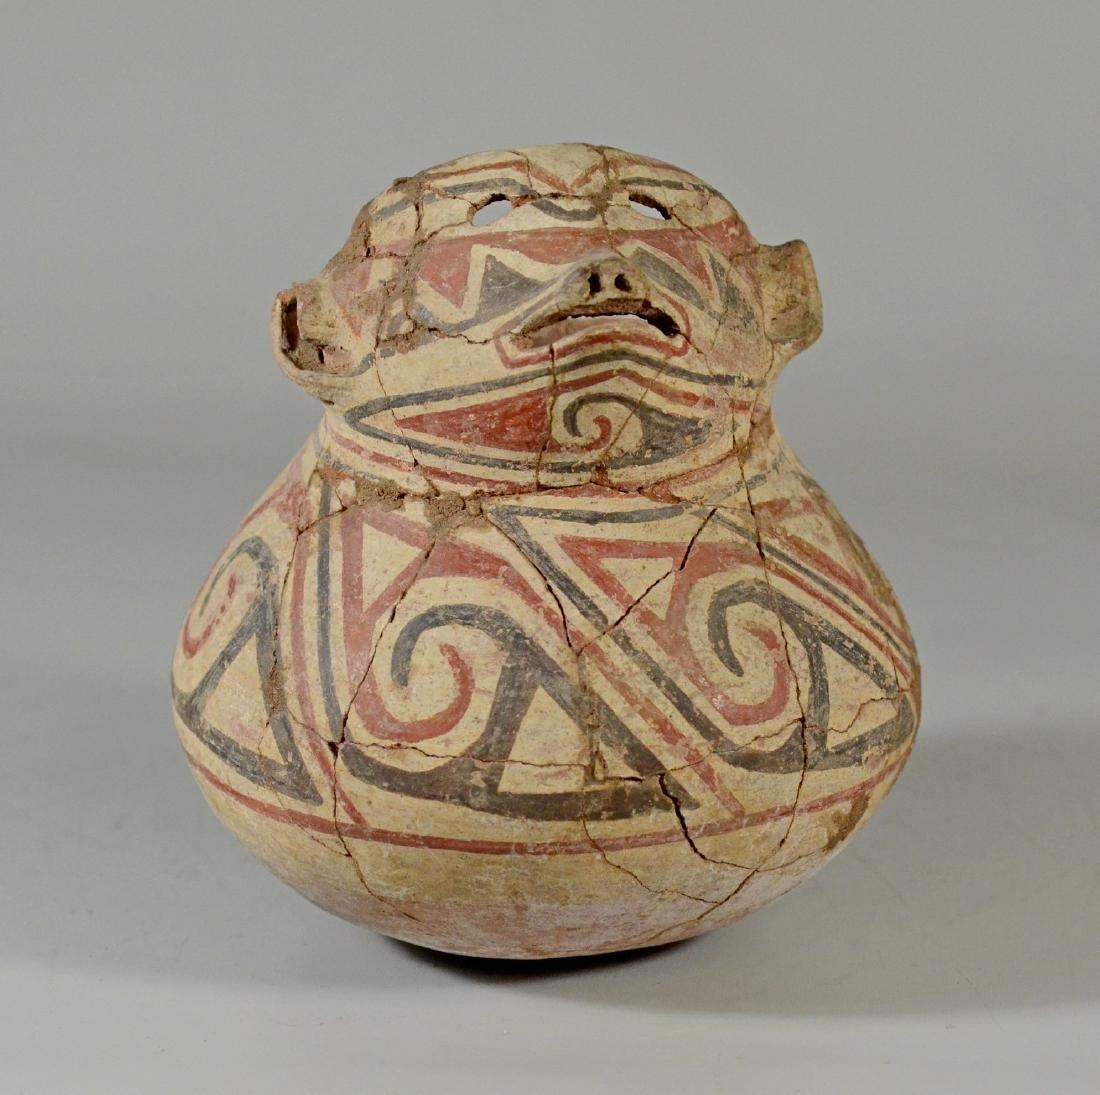 Pre-Columbian figural pot with extensive restoration